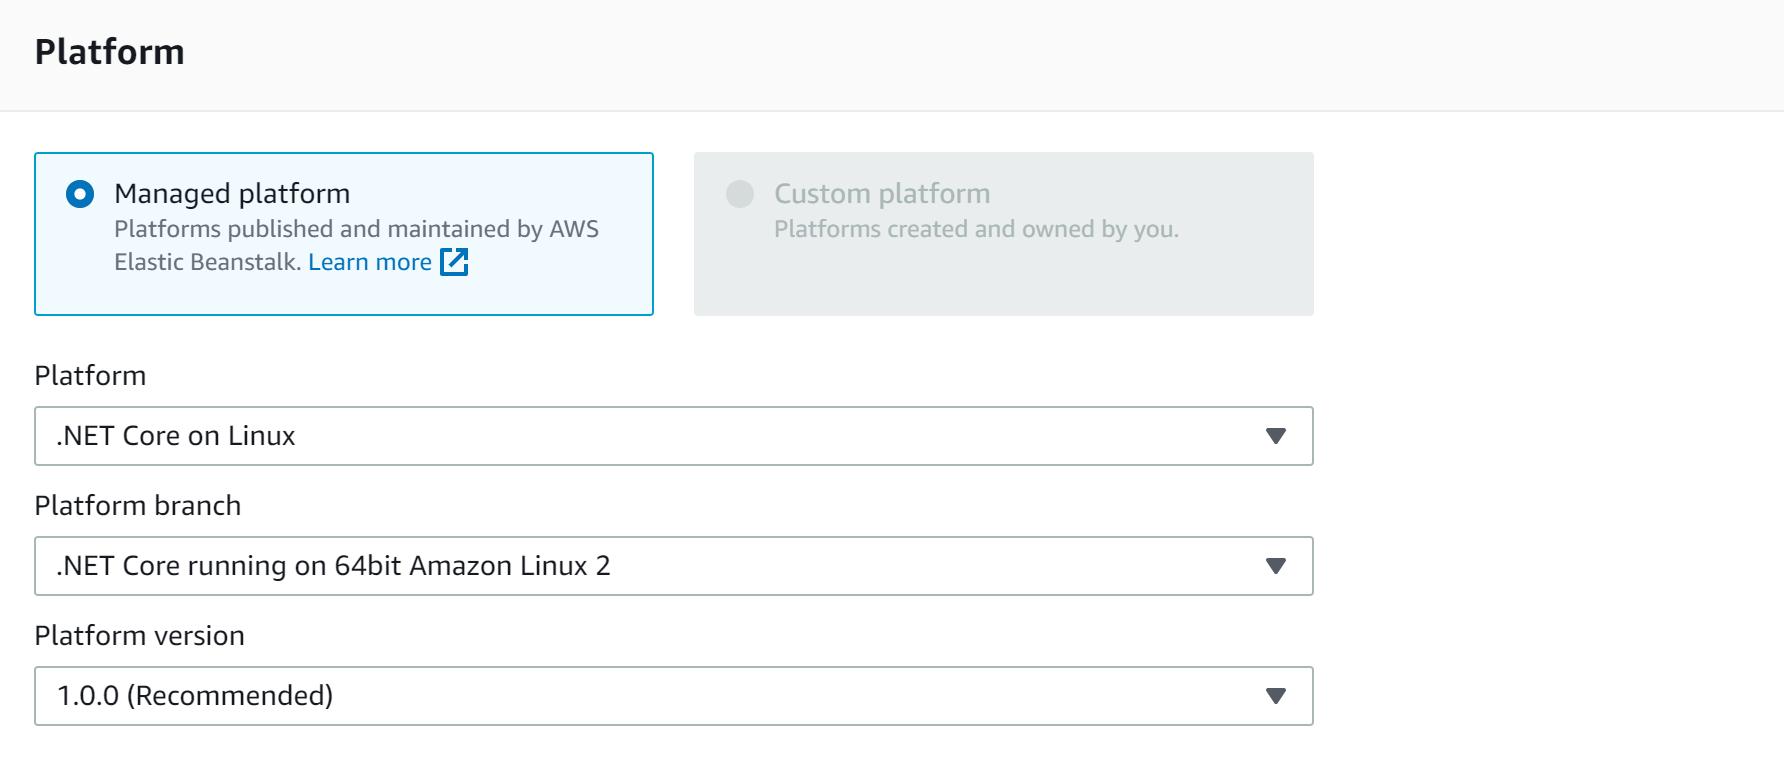 AWS console platform selector